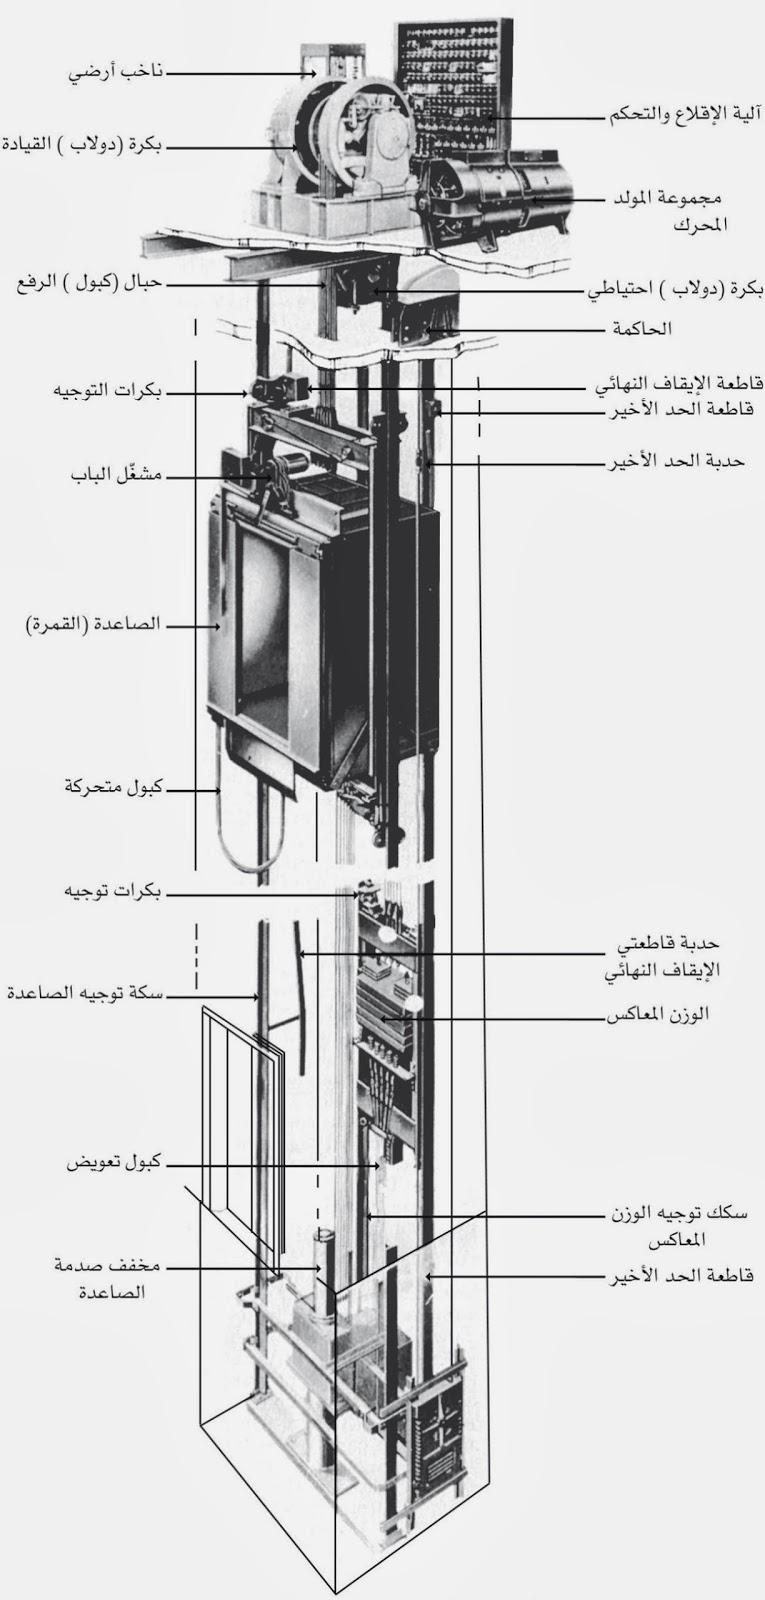 مكونات المصعد